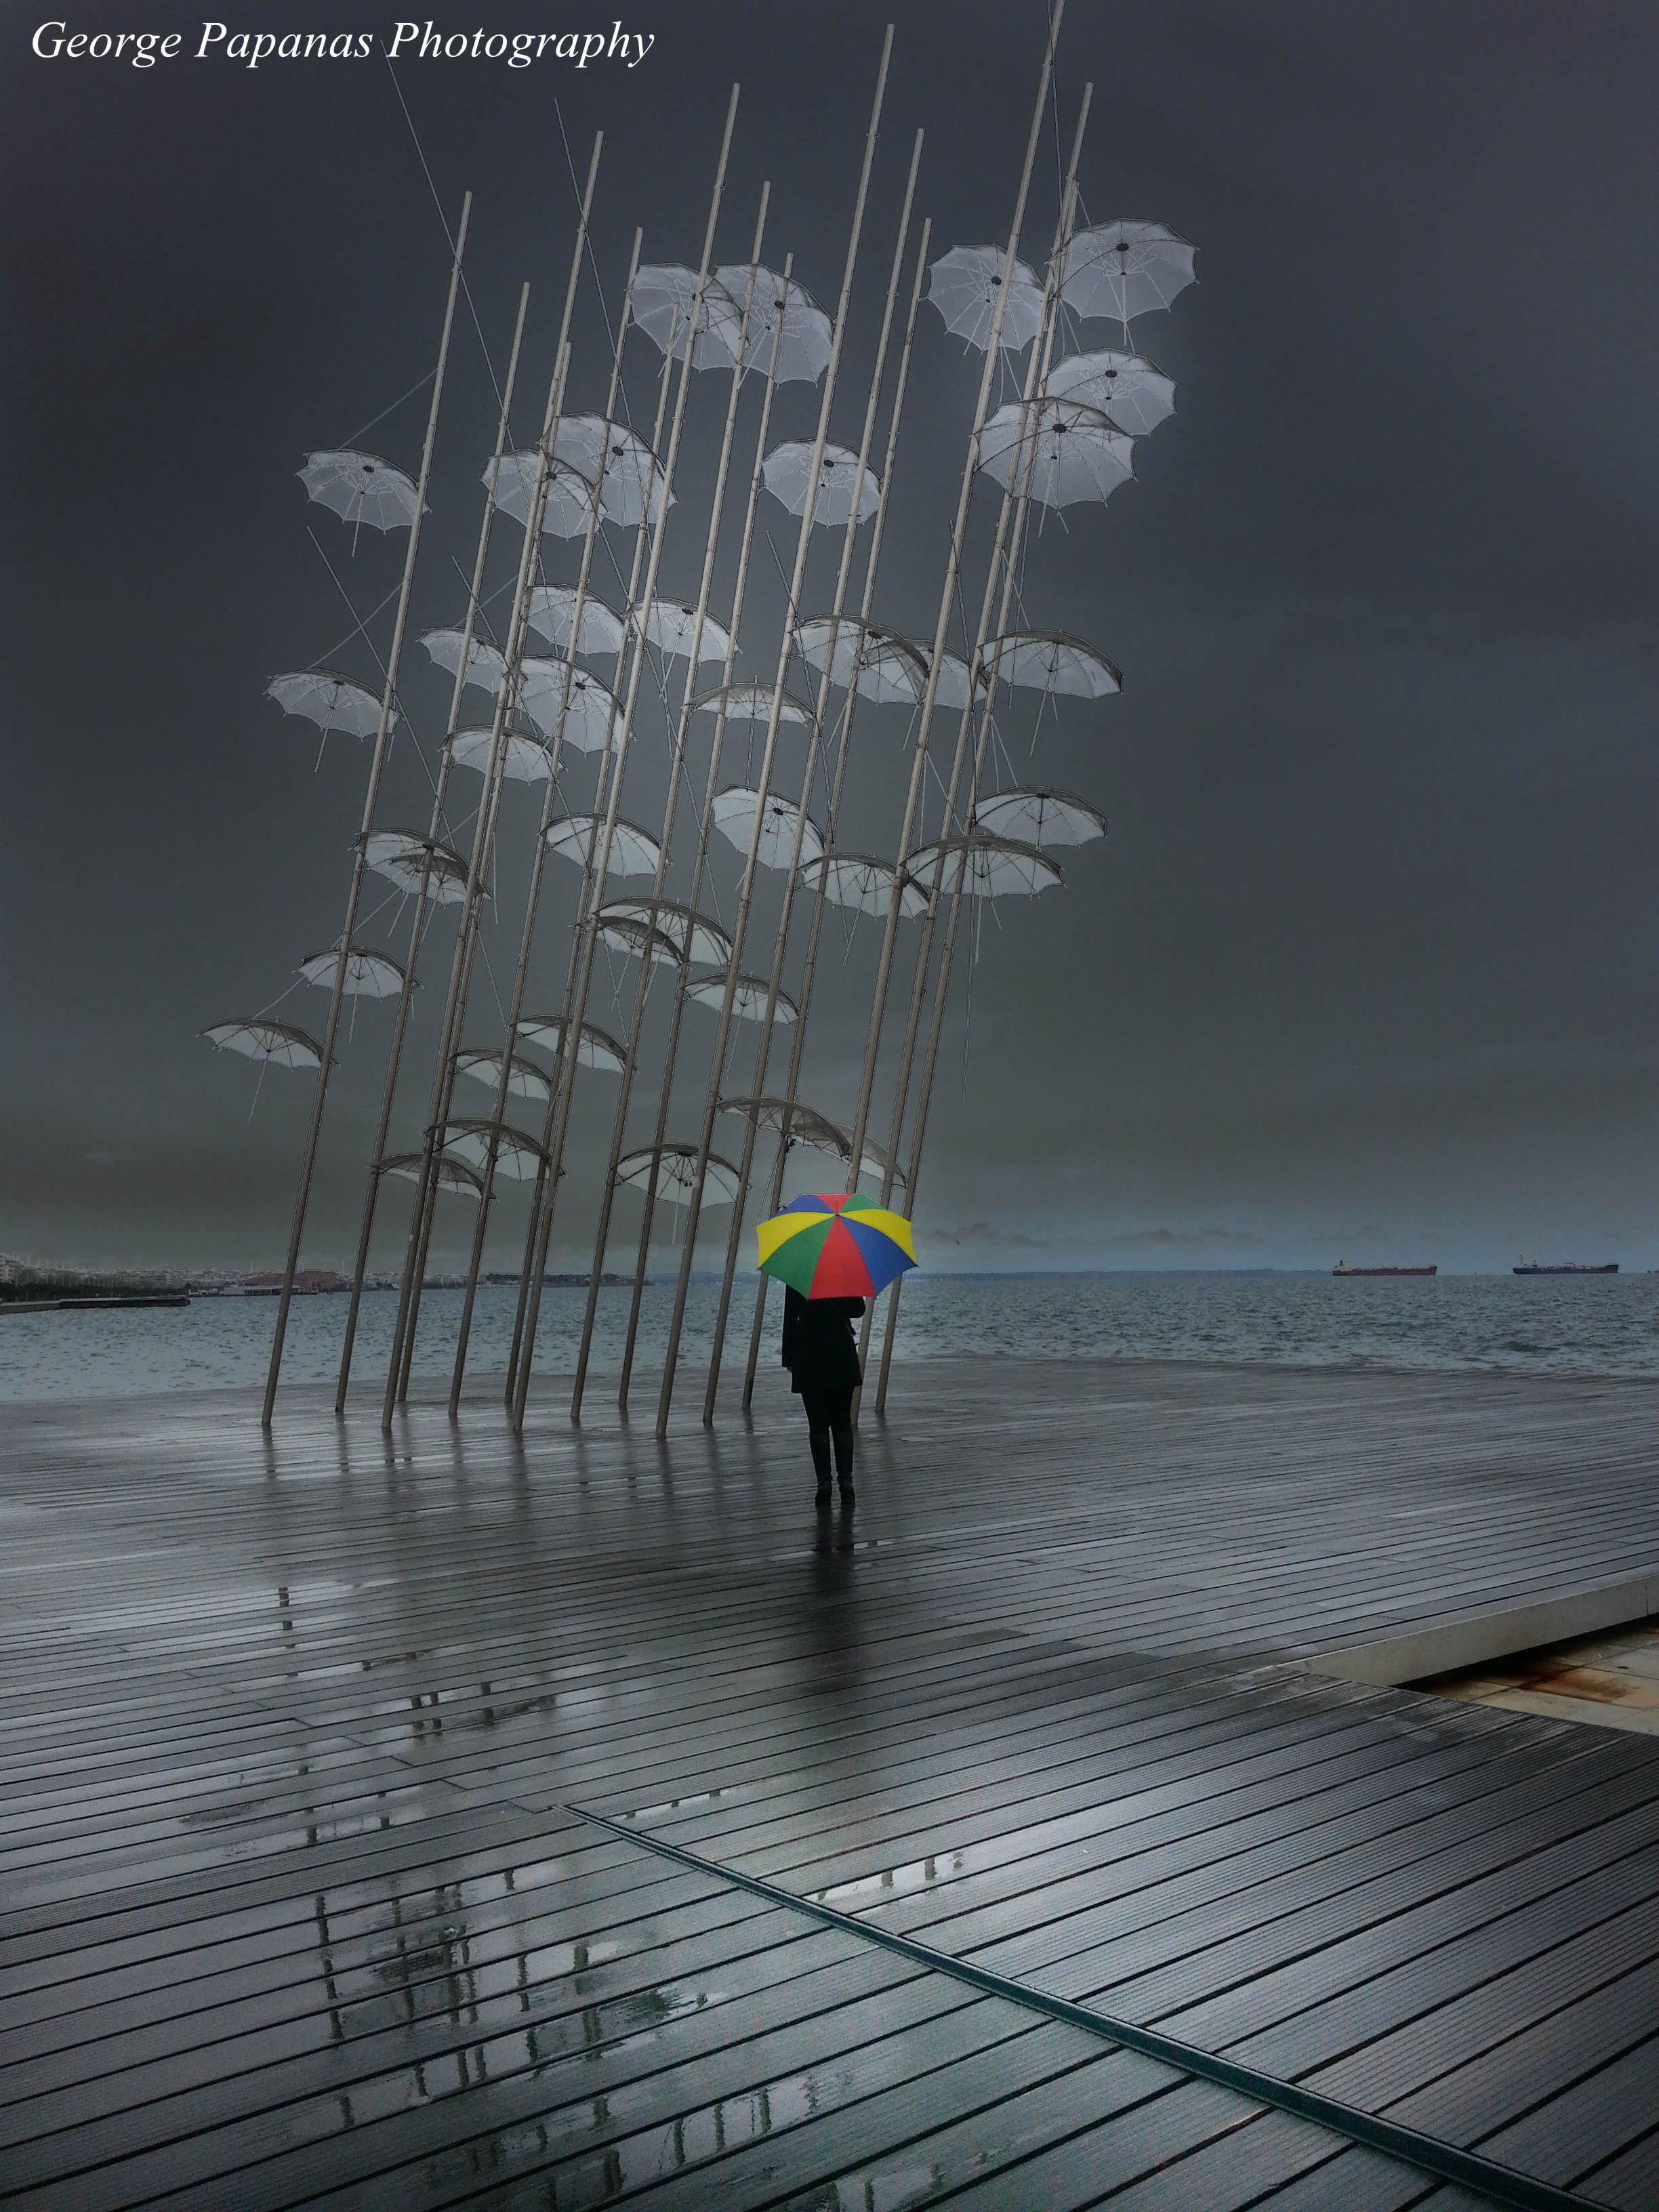 0edd87734 Ομπρέλες στη βροχή... Θεσσαλονίκη, Thessaloniki... | Thessaloniki ...